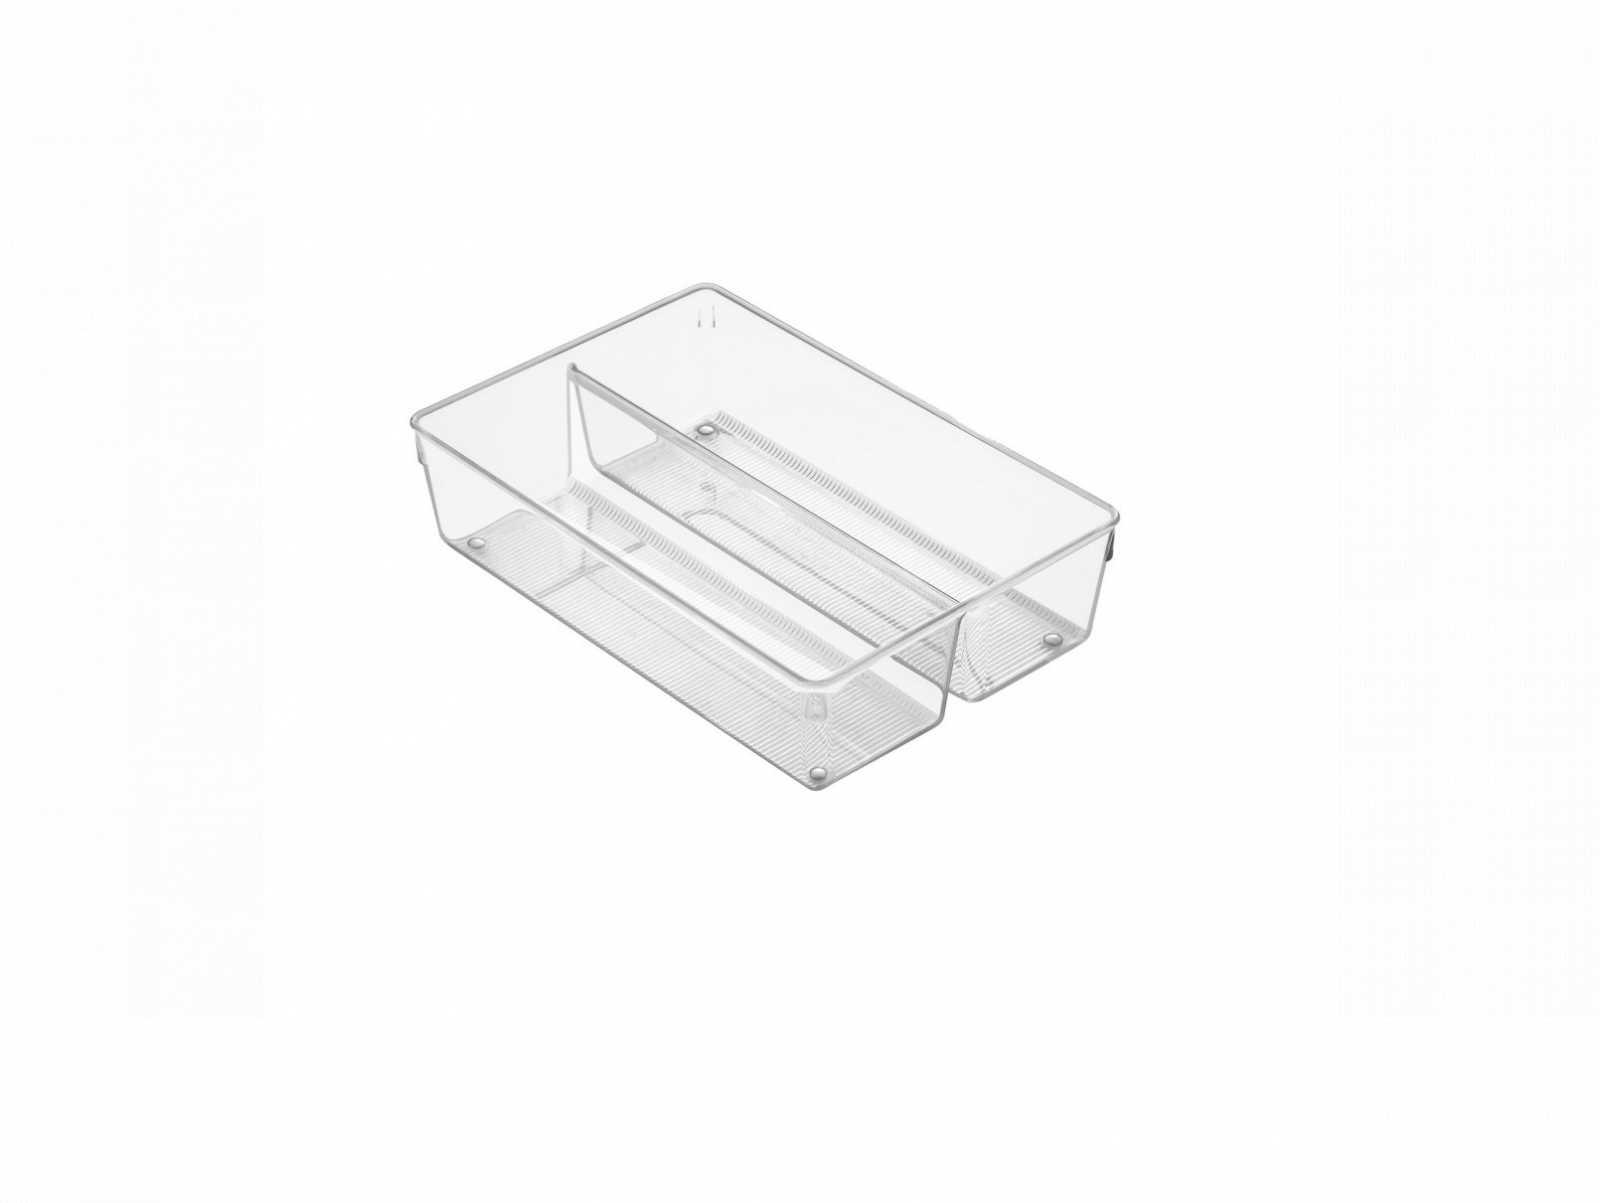 Онлайн каталог PROMENU: Органайзер для кухонных принадлежностей iDesign LINUS, 30,5х20,3х7,6 см, BPA-free пластик, прозрачный                                   56130EU